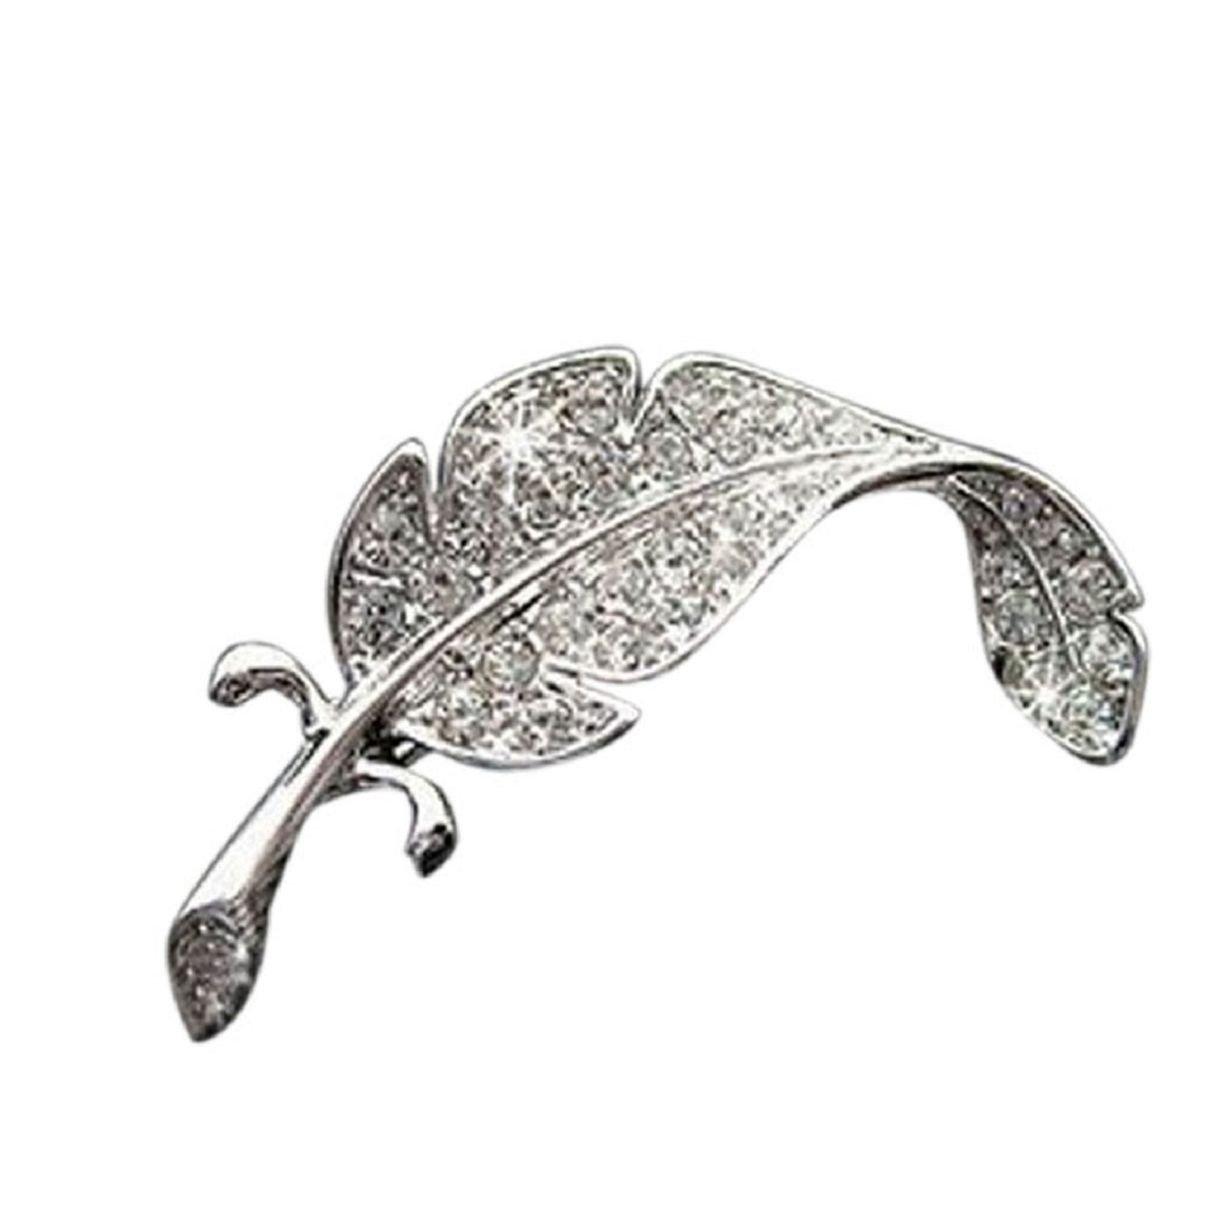 843f9a31a Amazon.com: Welcomeuni New Retro Vintage Cute Beautiful Feather Leaf Mini  Cute Brooch Pin: Jewelry